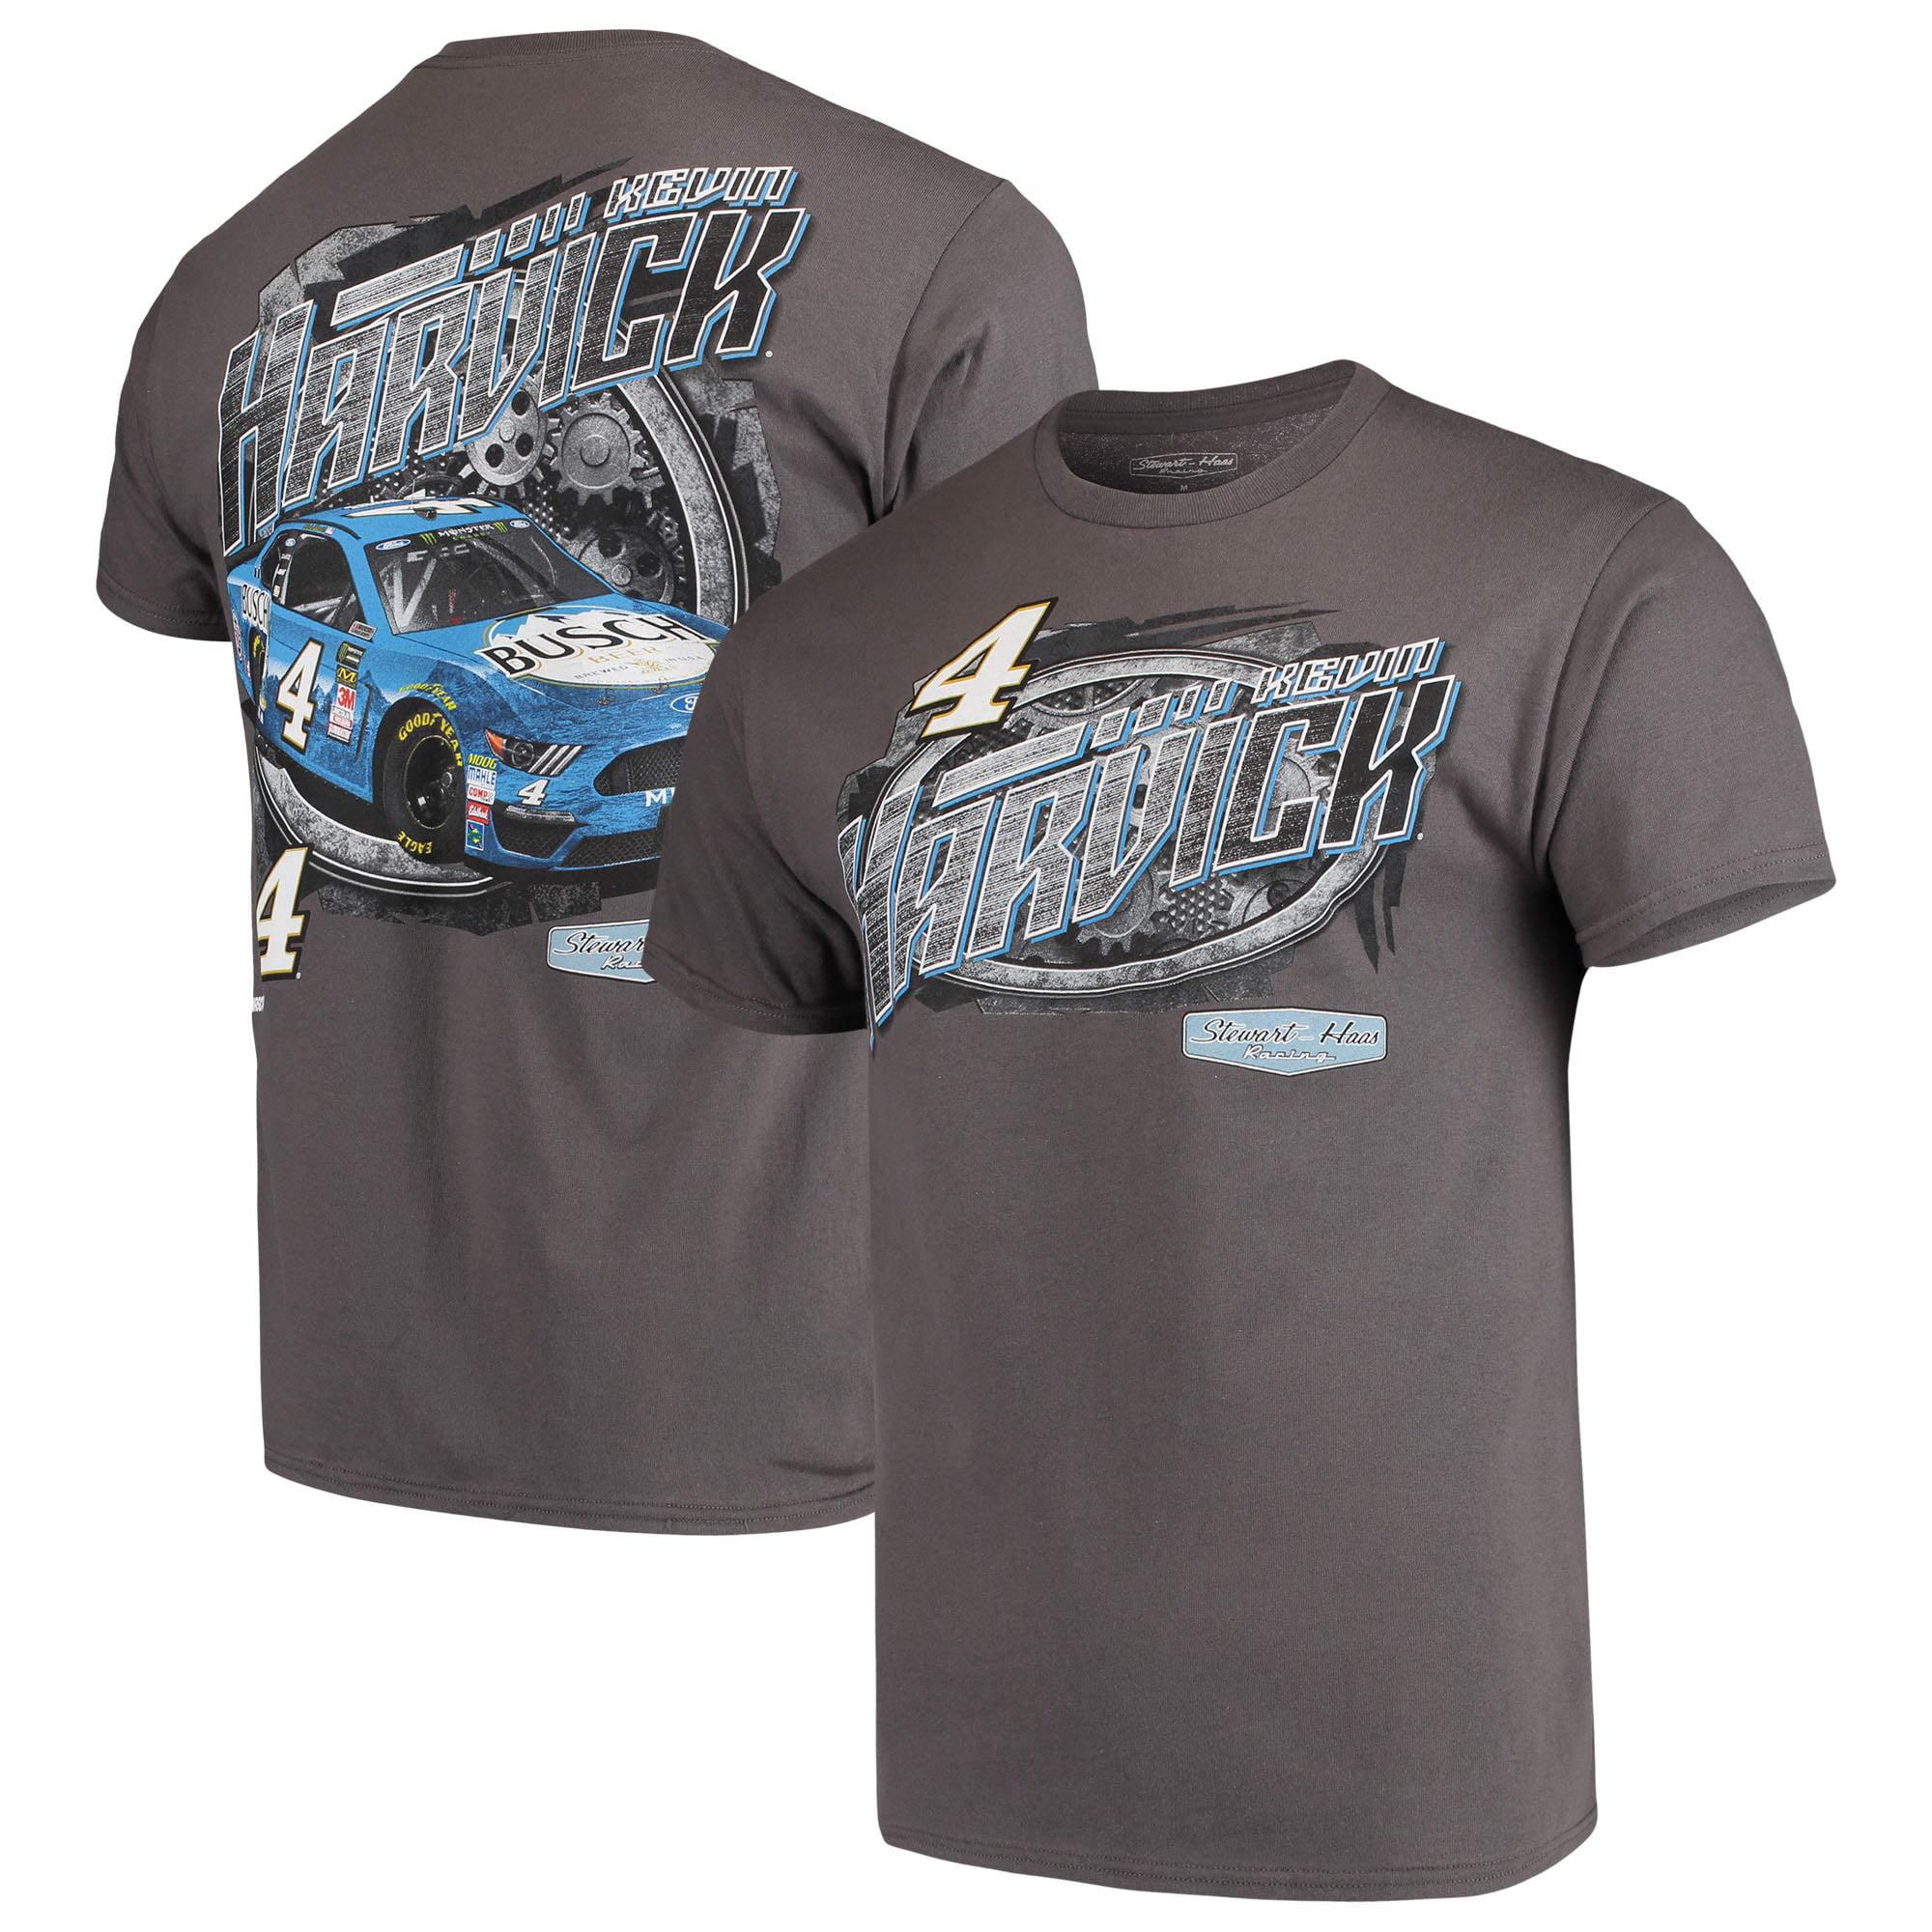 Kevin Harvick Steel Thunder Driver T-Shirt - Charcoal